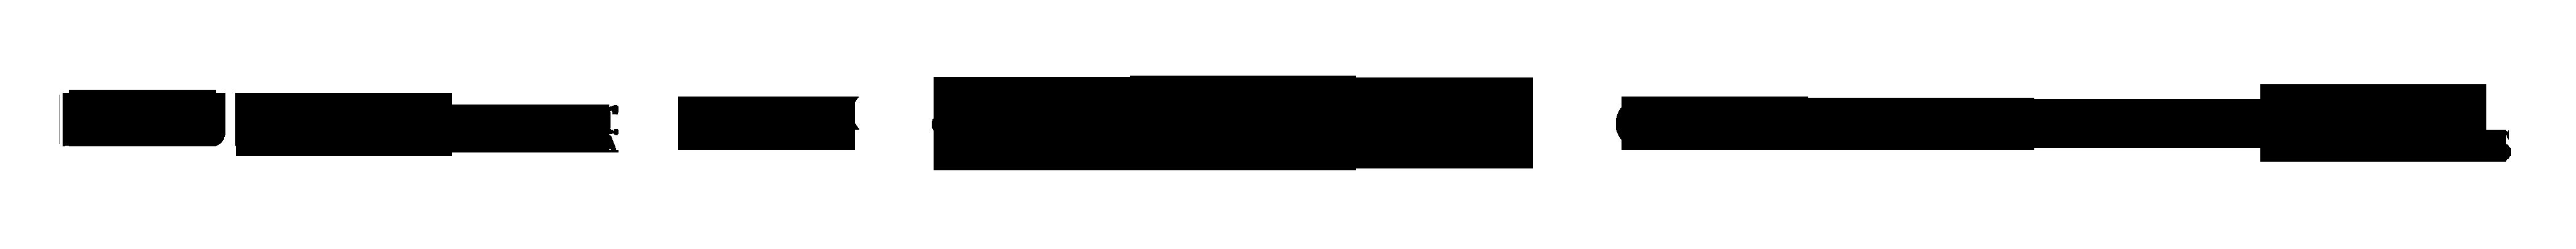 featured-black